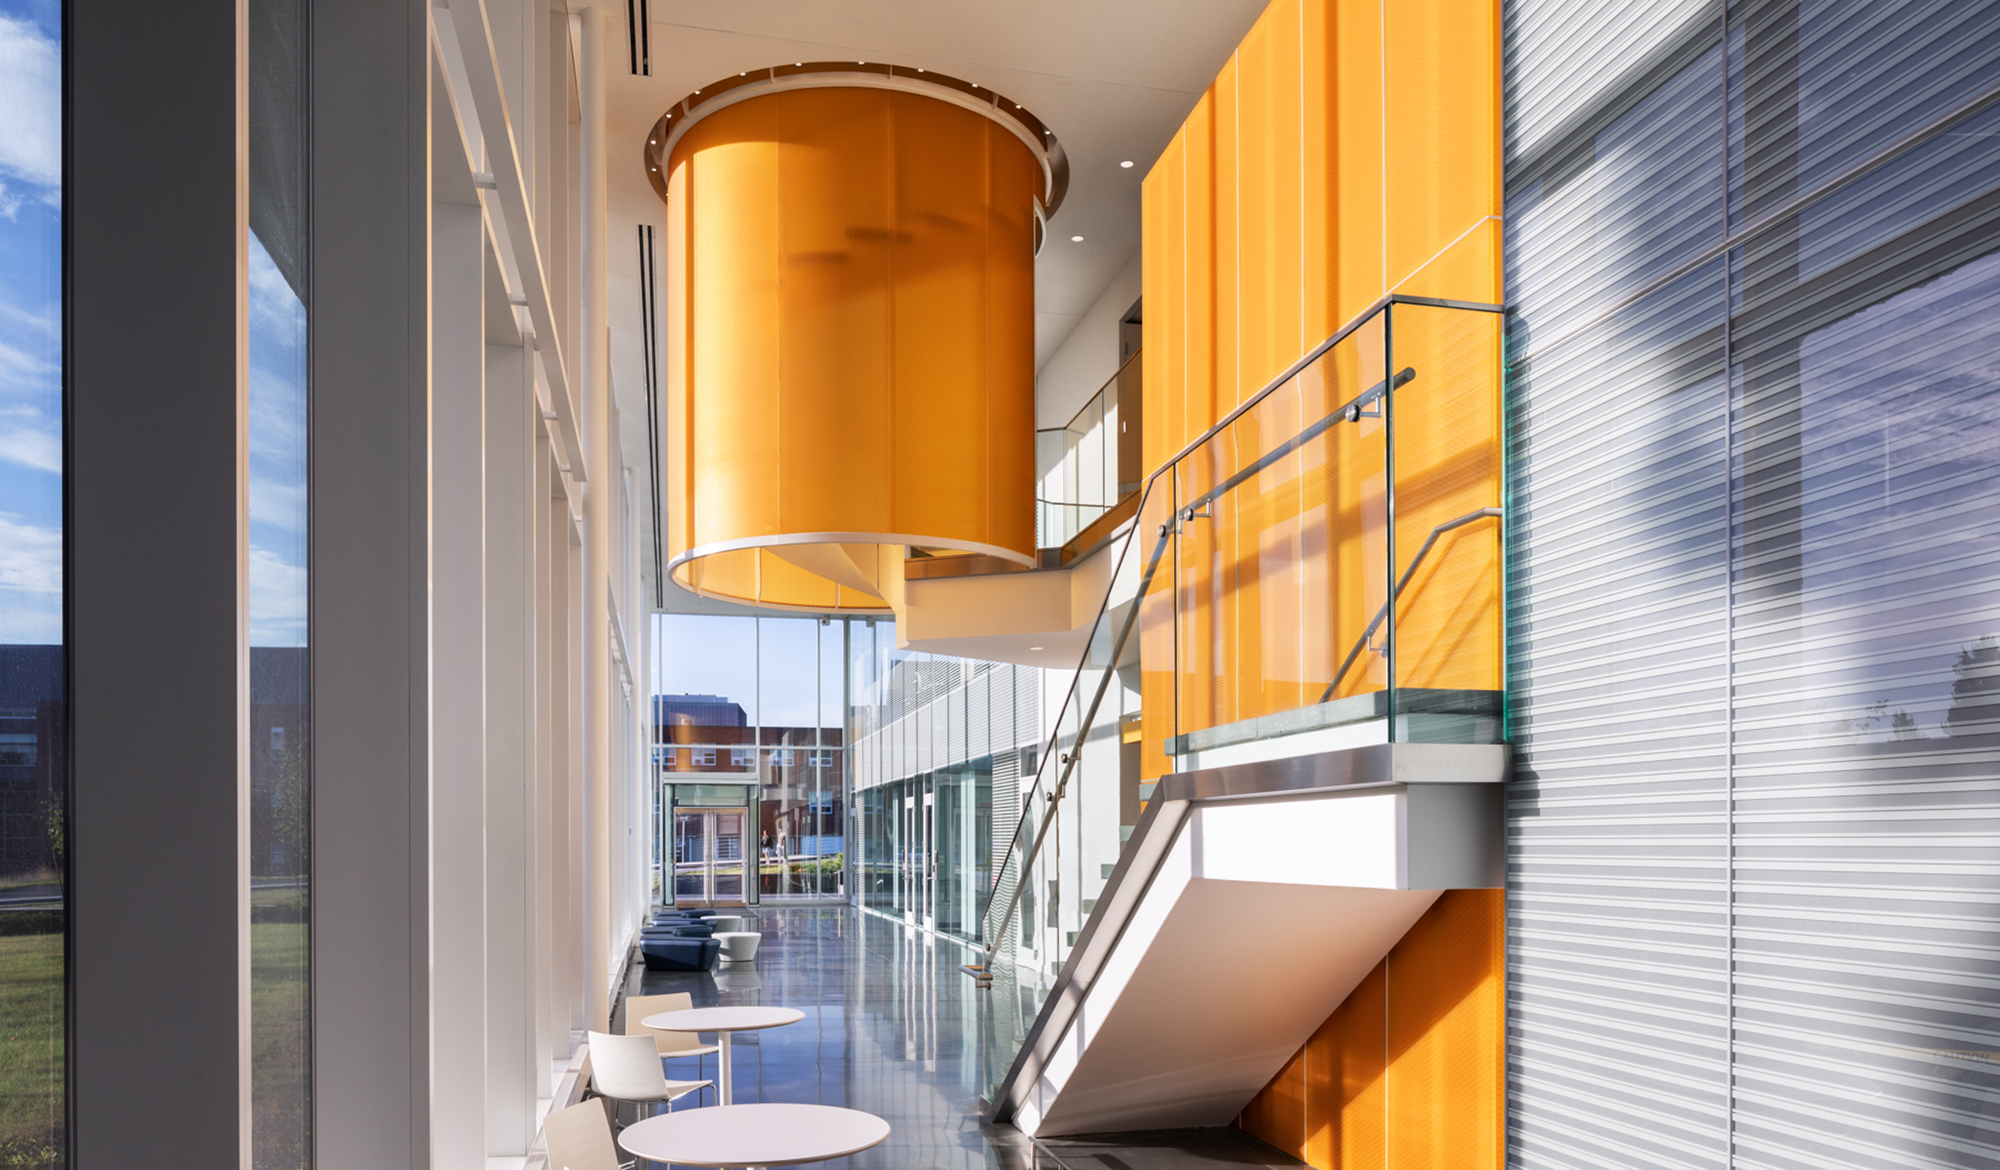 University of Rhode Island Fascitelli Center Ballinger - translucent honeycomb stair enclosure